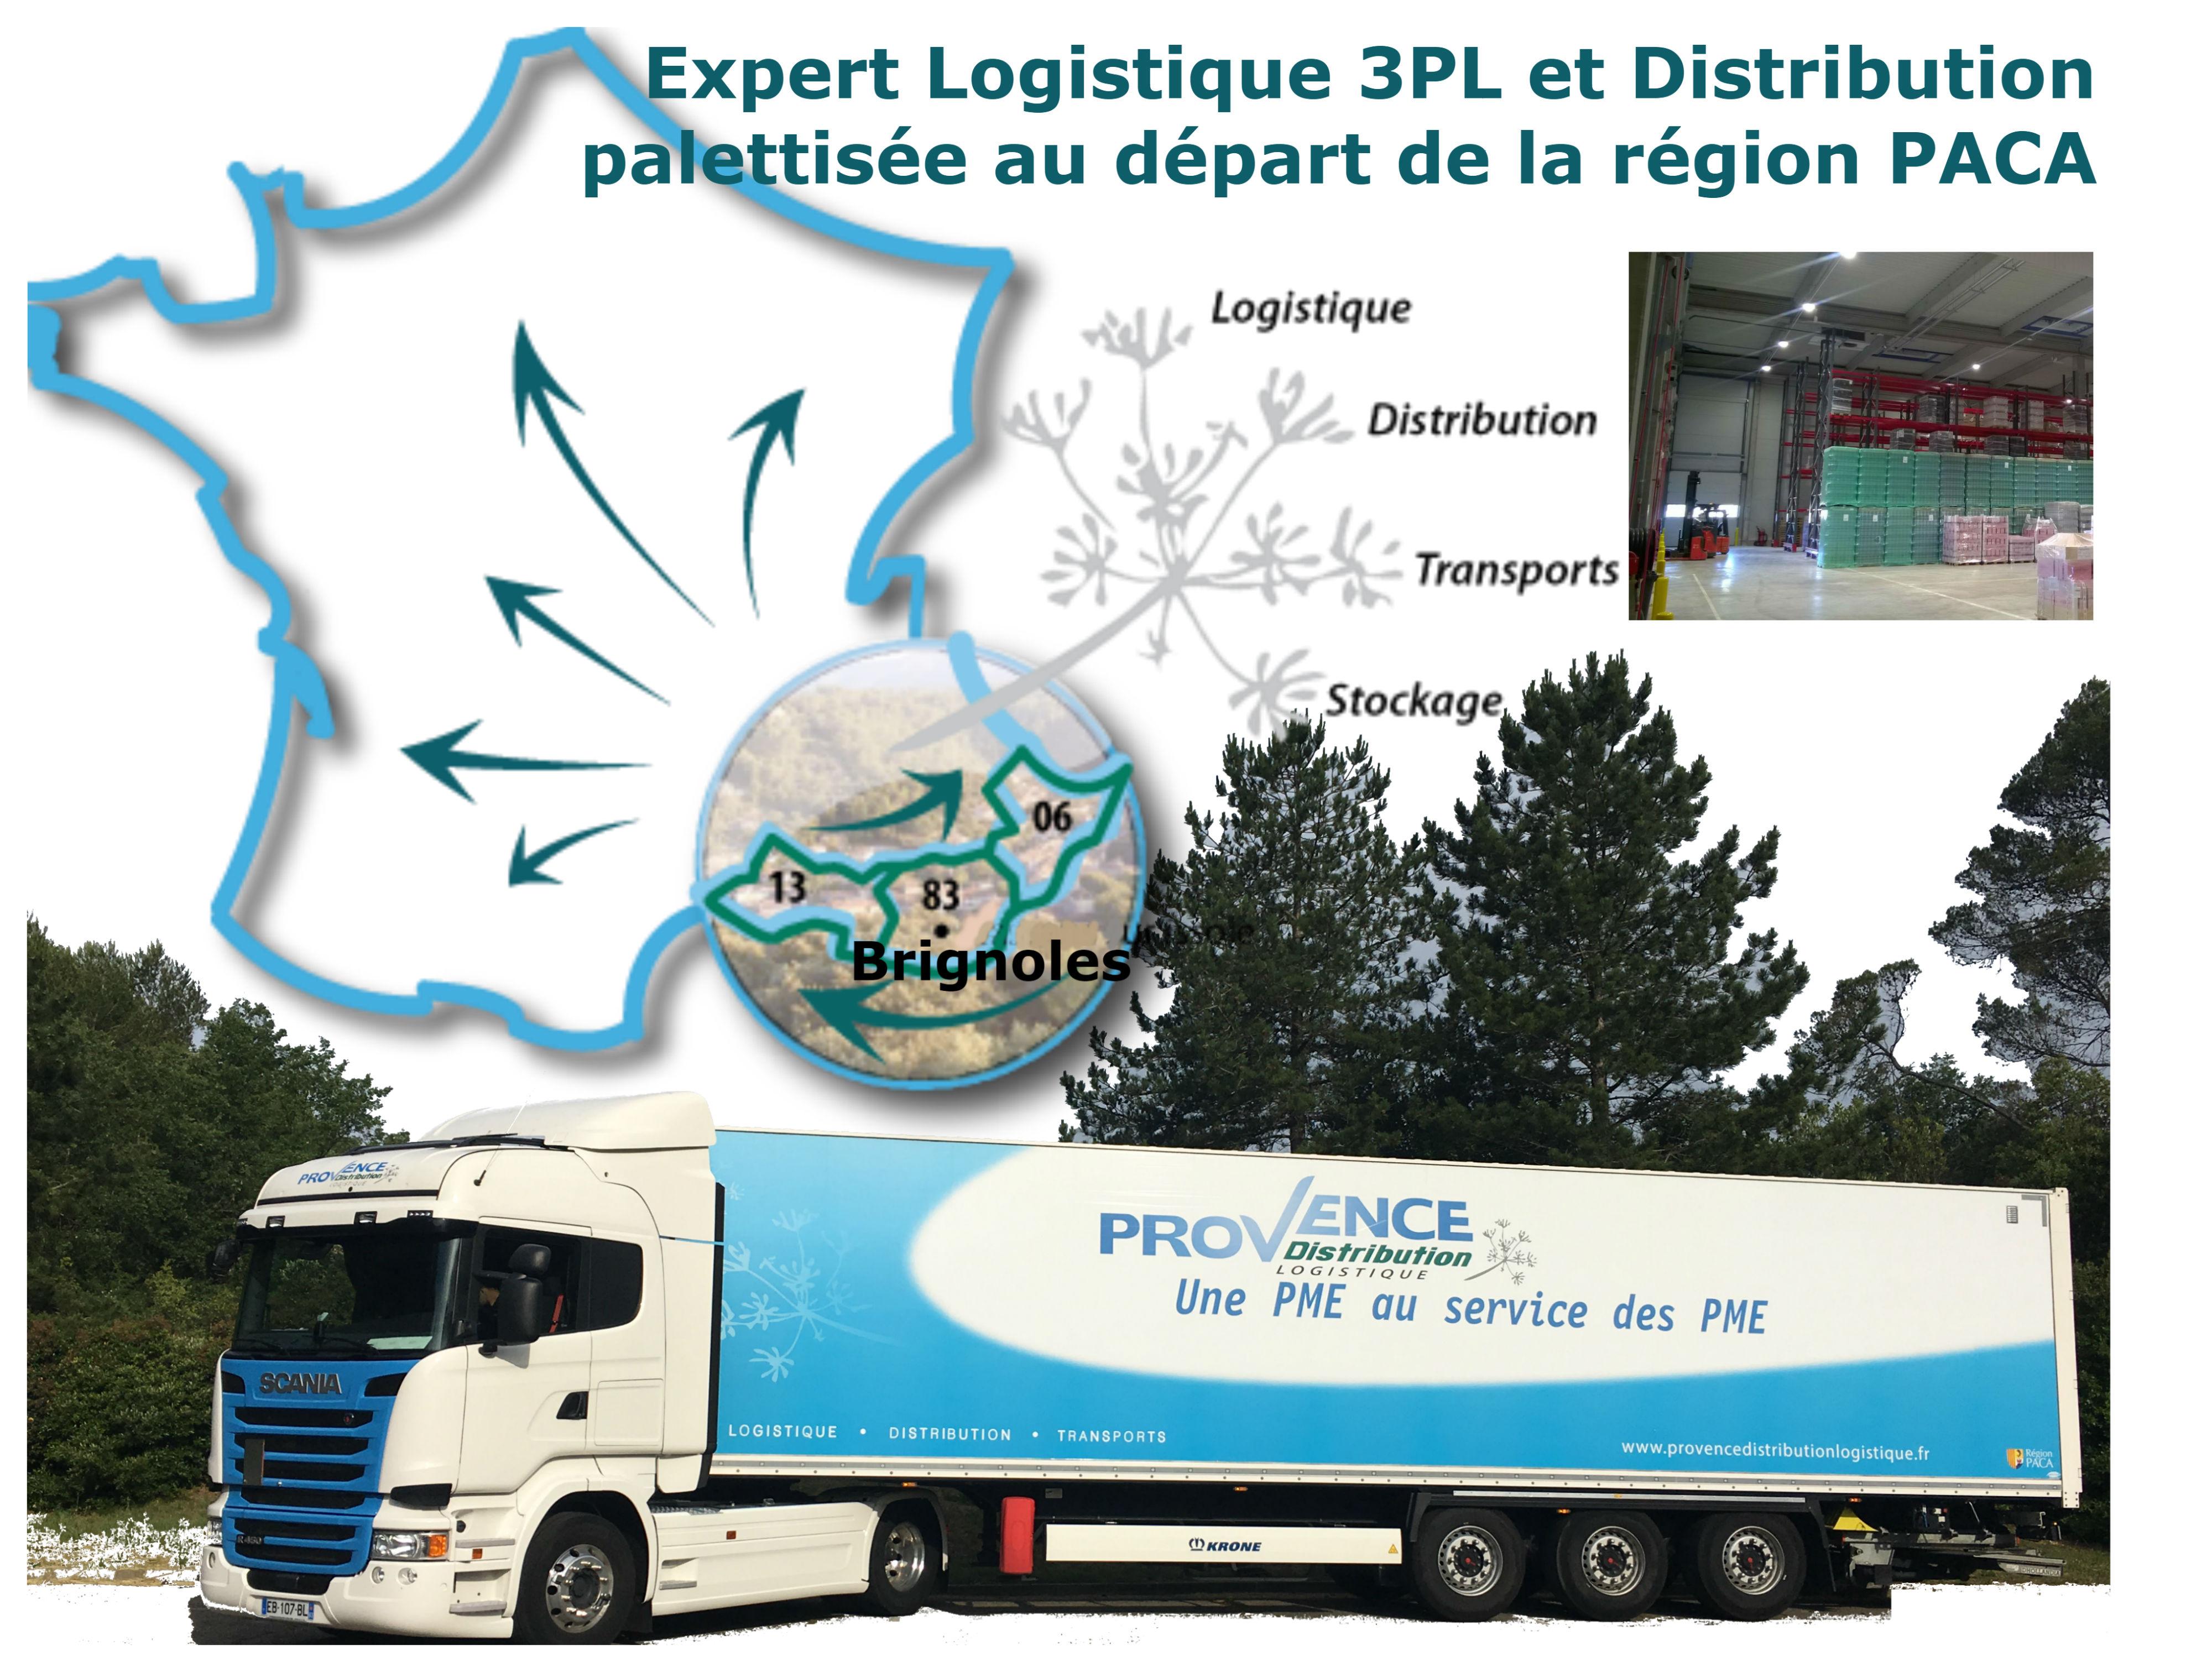 provence distribution logistique zone distribution implantation provence distribution logistique